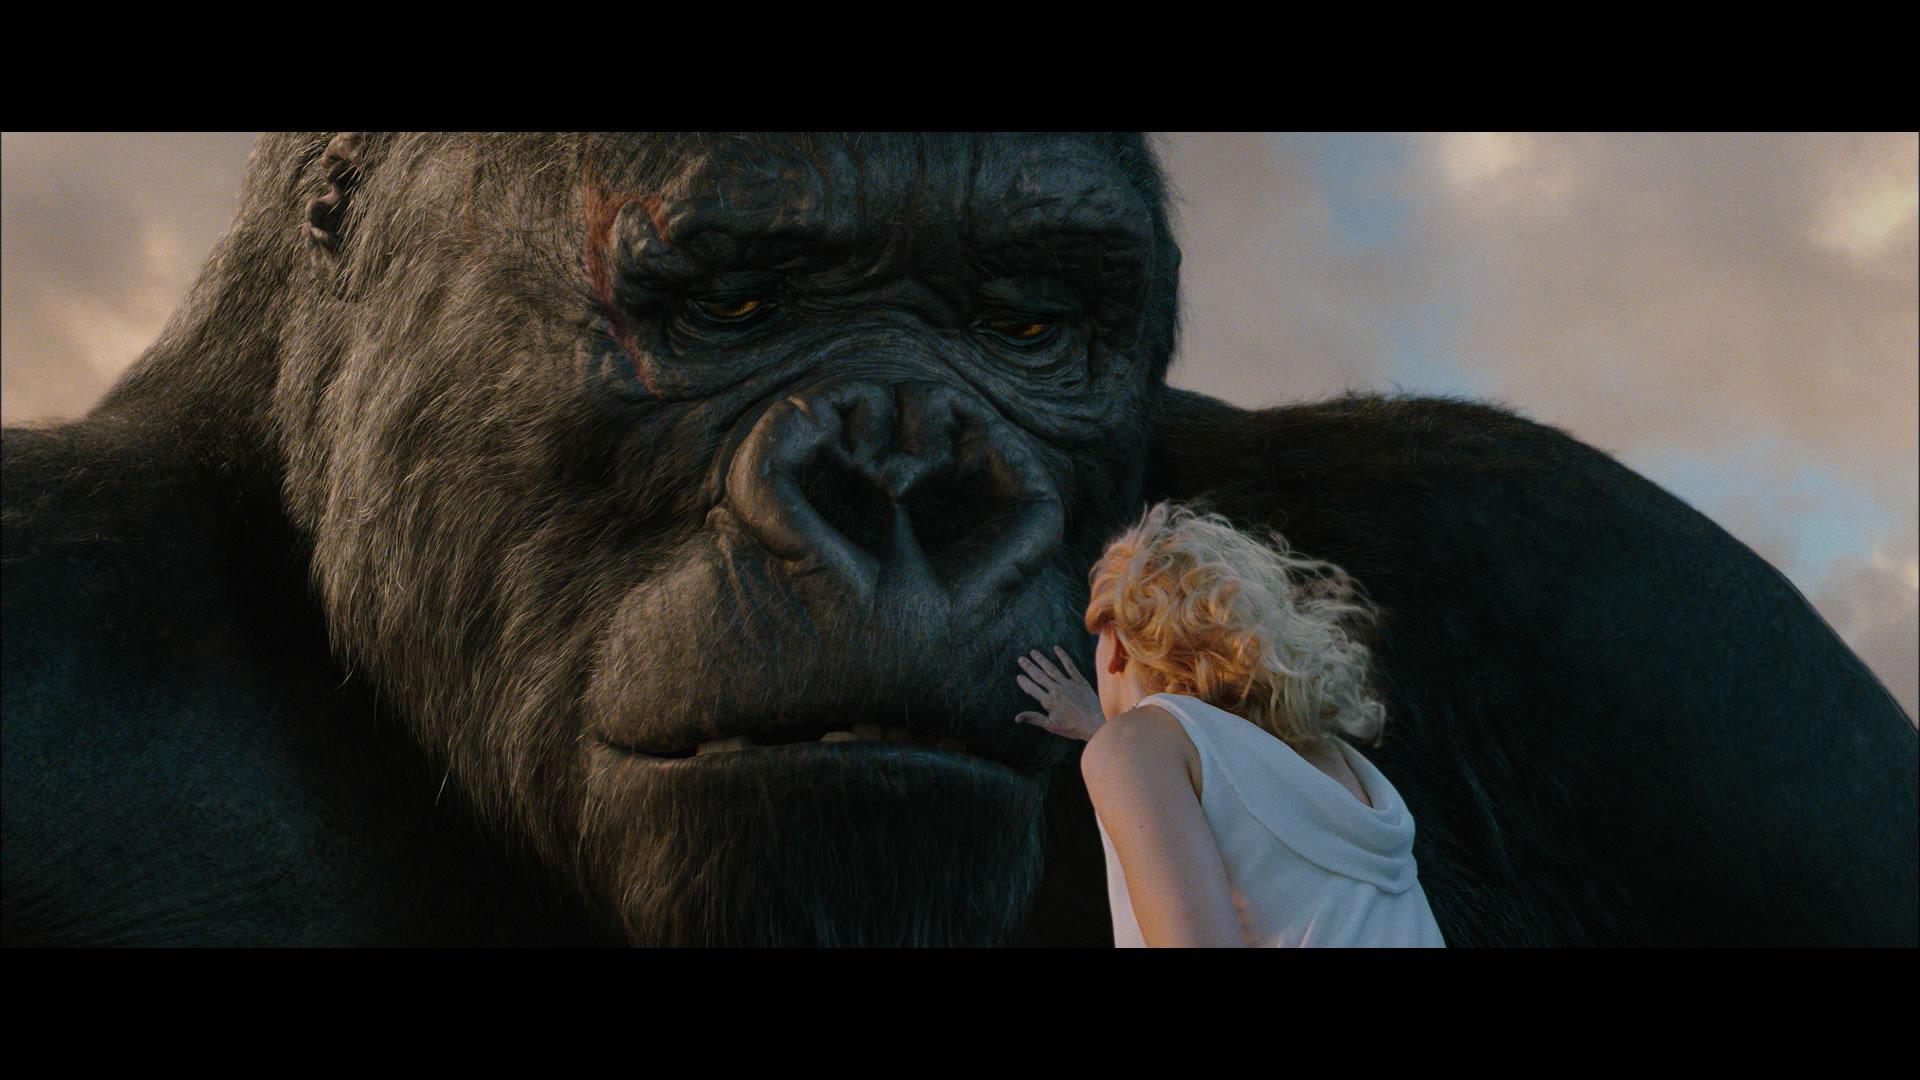 King Kong Movie screenshot 1920x1080 (11).jpg